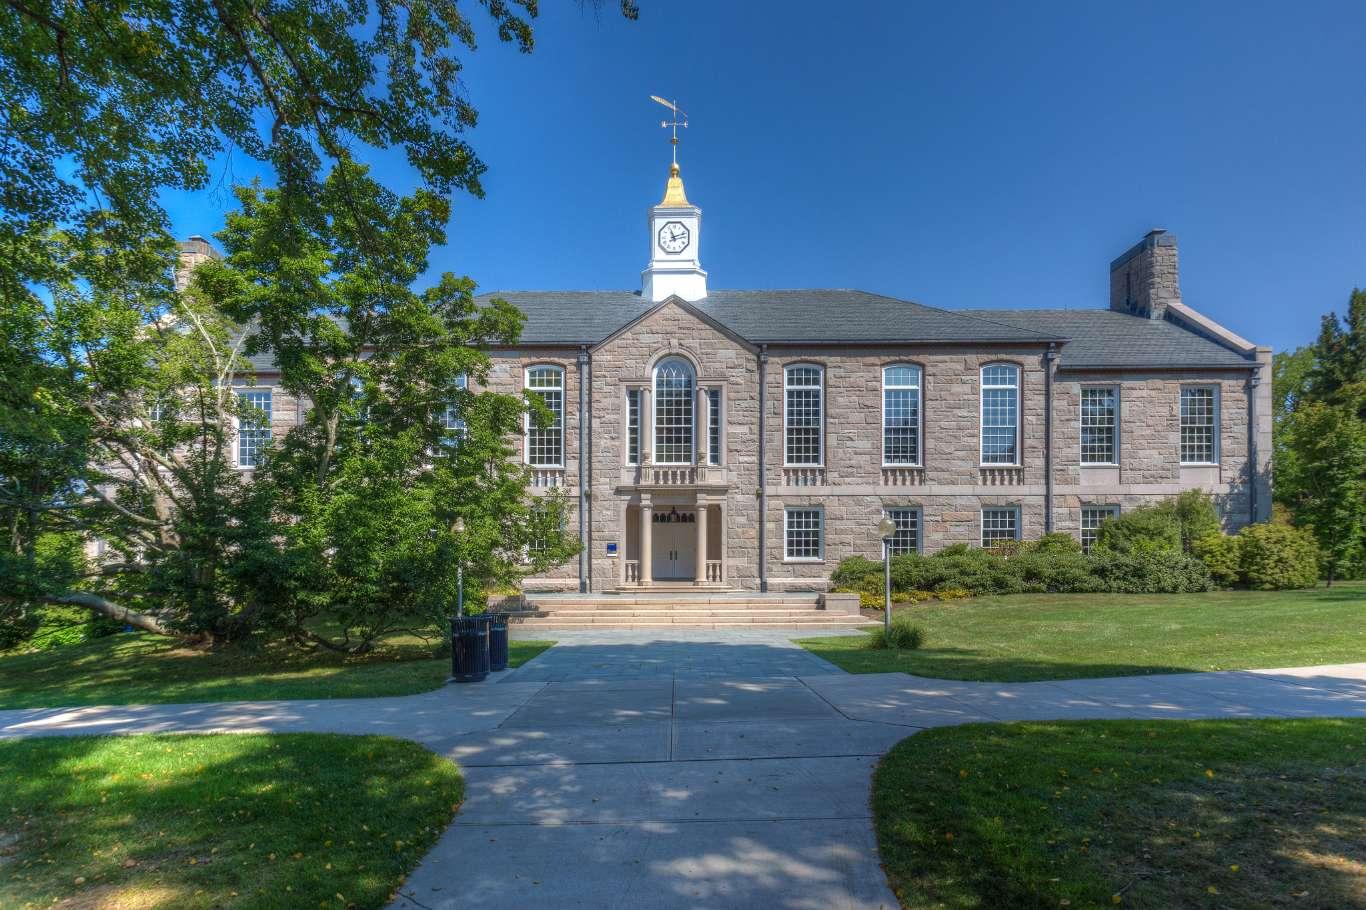 University Of Rhode Island >> Experience University Of Rhode Island In Virtual Reality